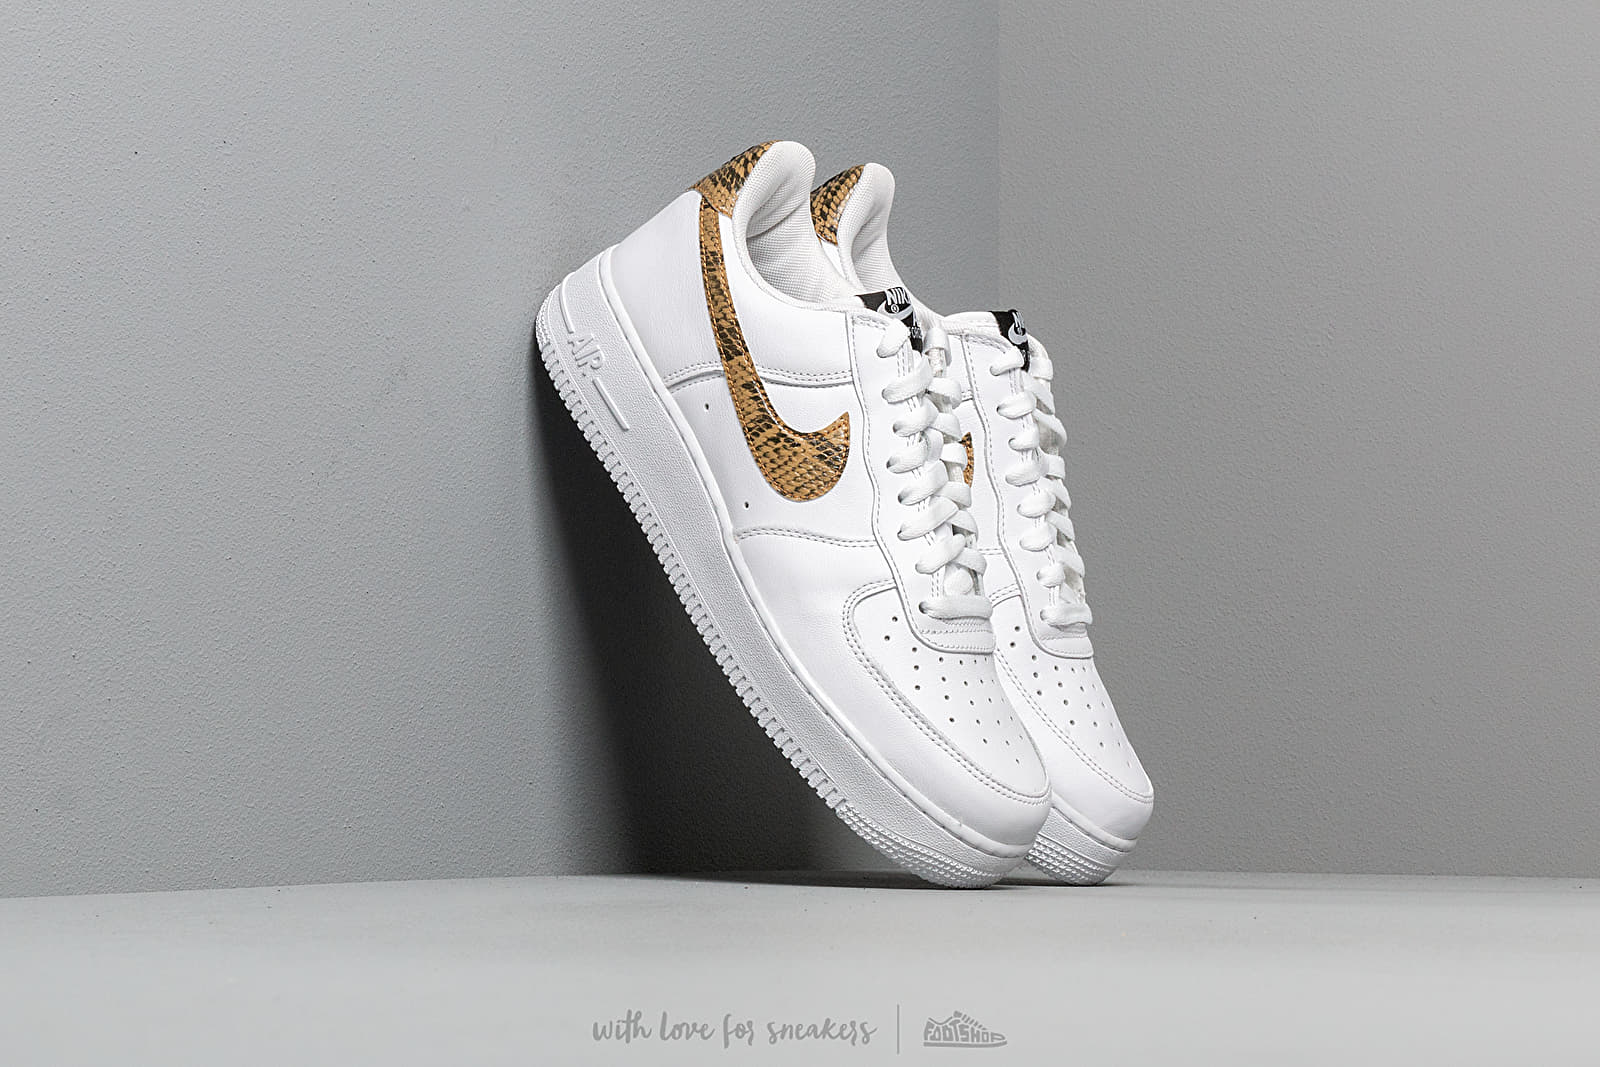 cc07b524410 Nike Air Force 1 Low Retro Prm QS White/ Elemental Gold-Dark Hazel ...